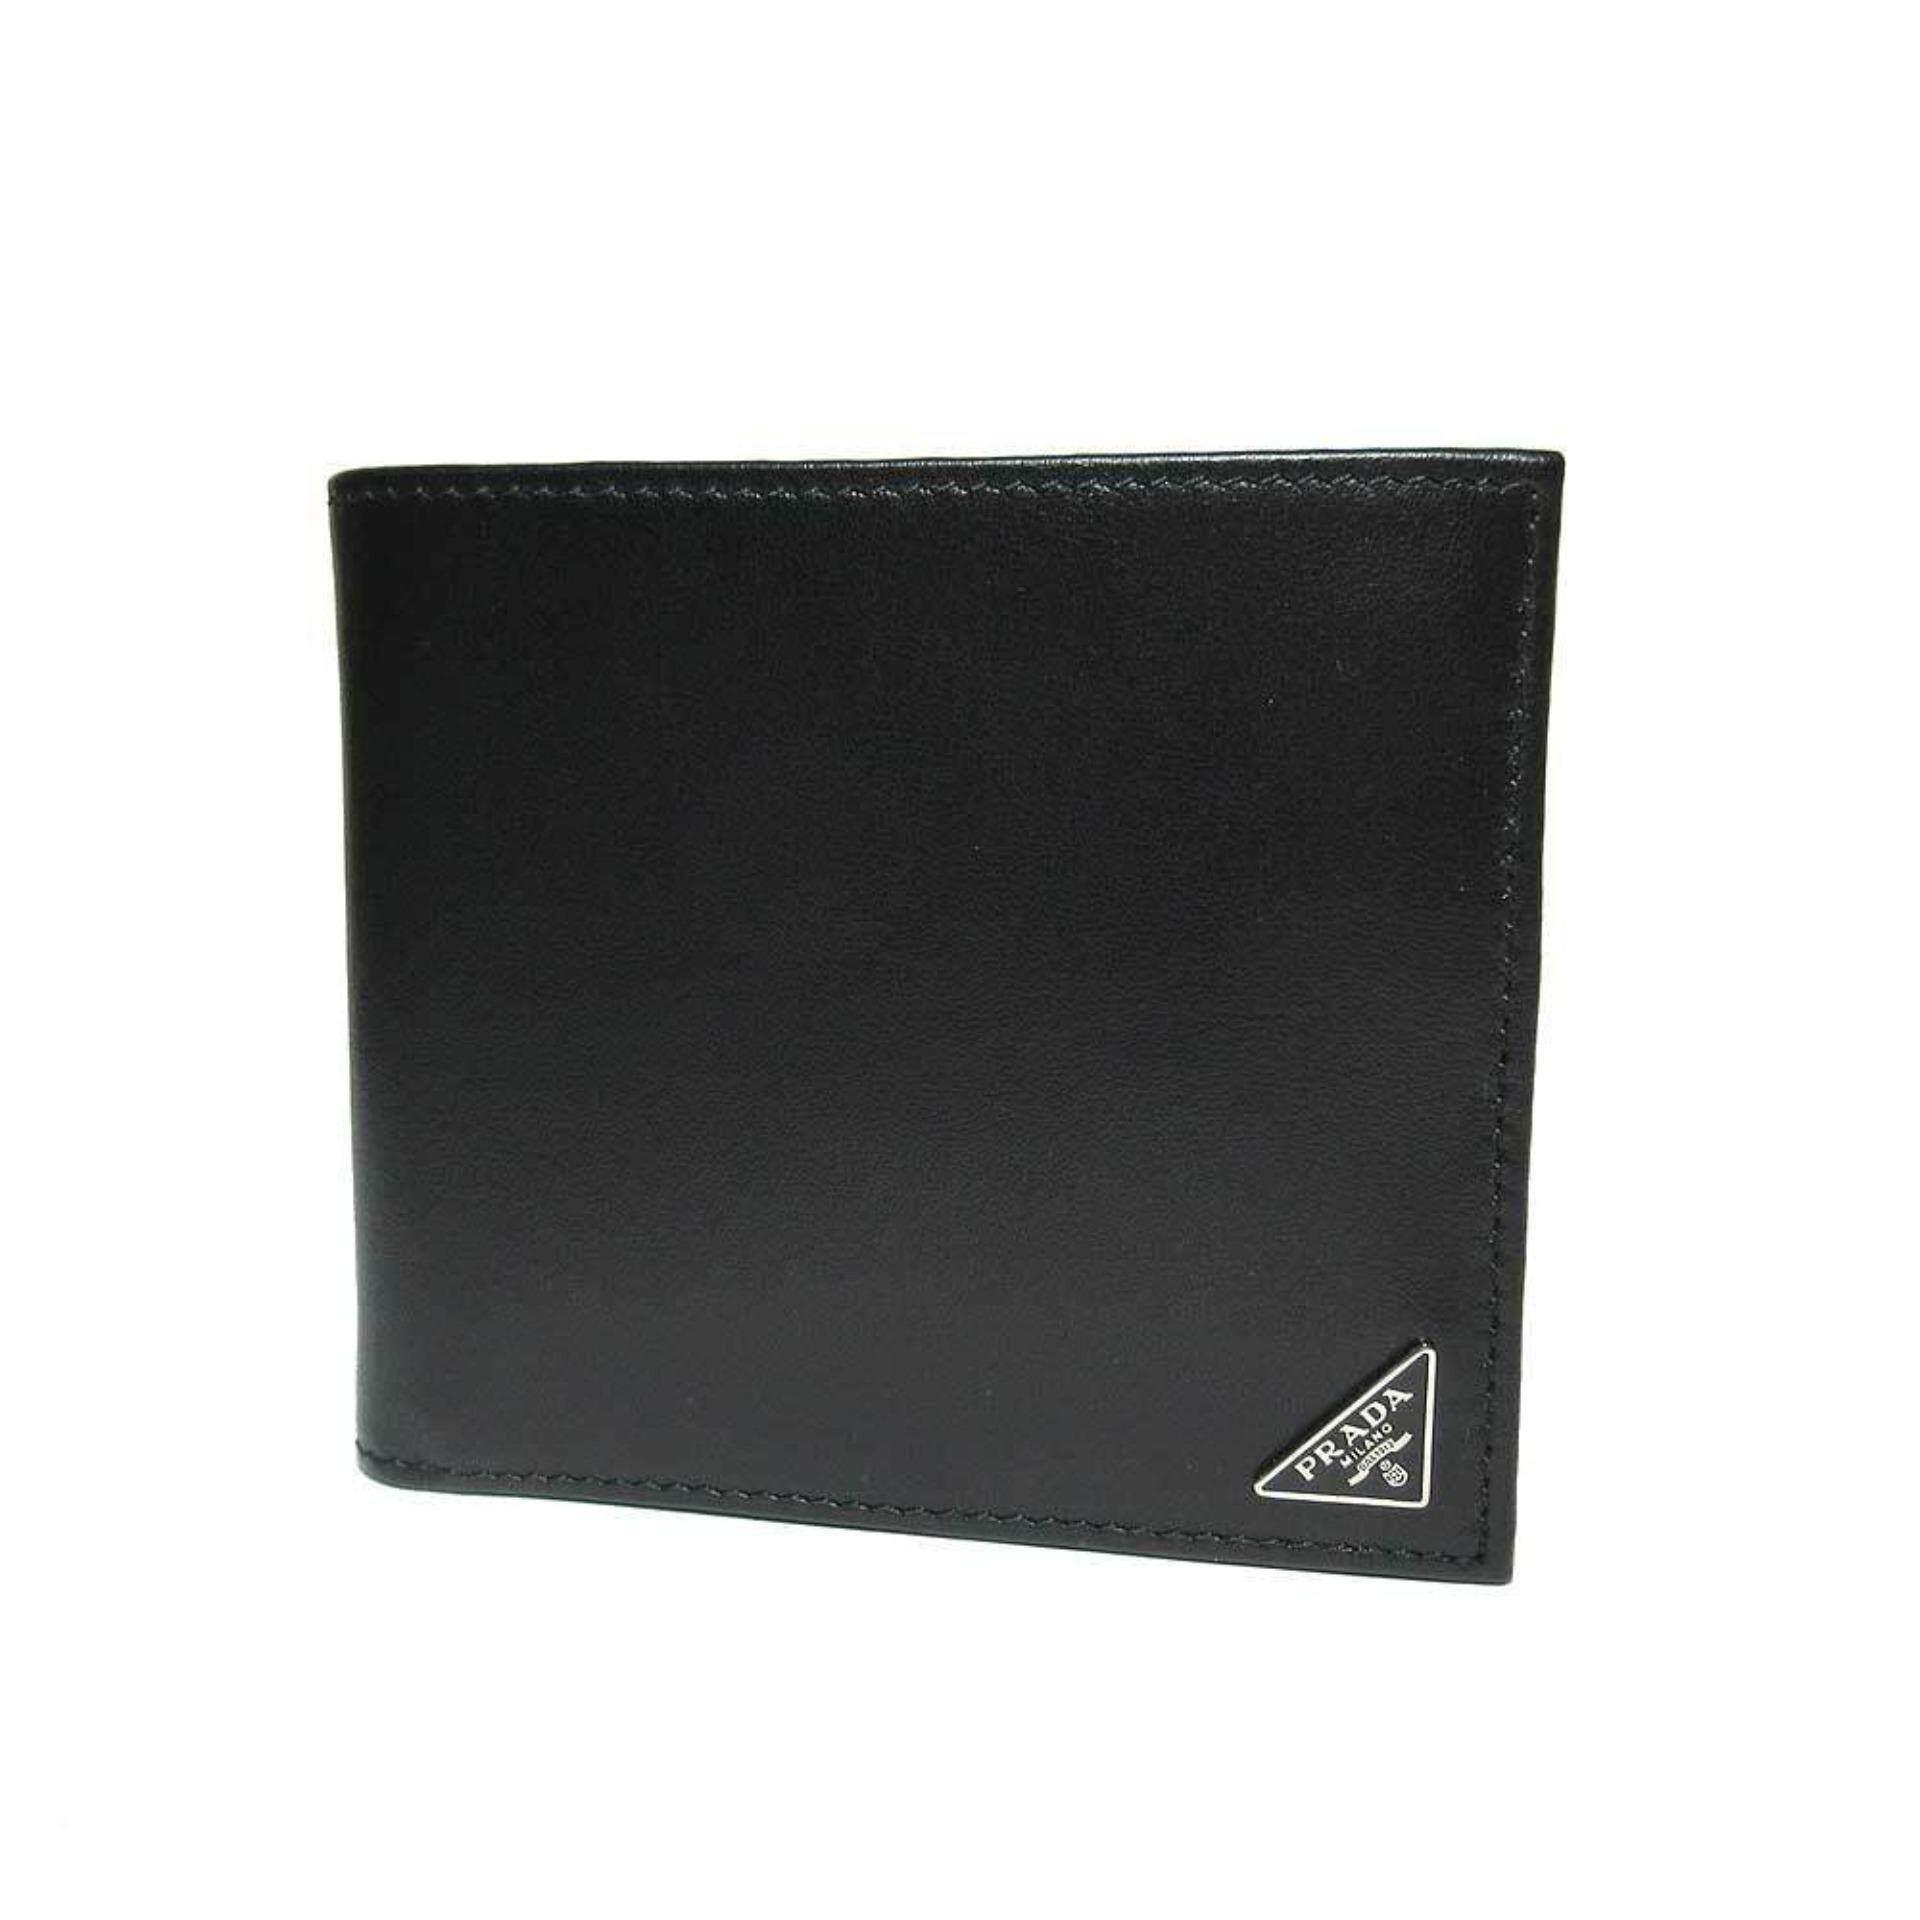 3c5ba13630f7 where to buy prada mens wallet 93349 bafe3; cheap coupon code for prada  leather bi fold wallet with coin purse 05fbb 46086 e1cb4 17ab6